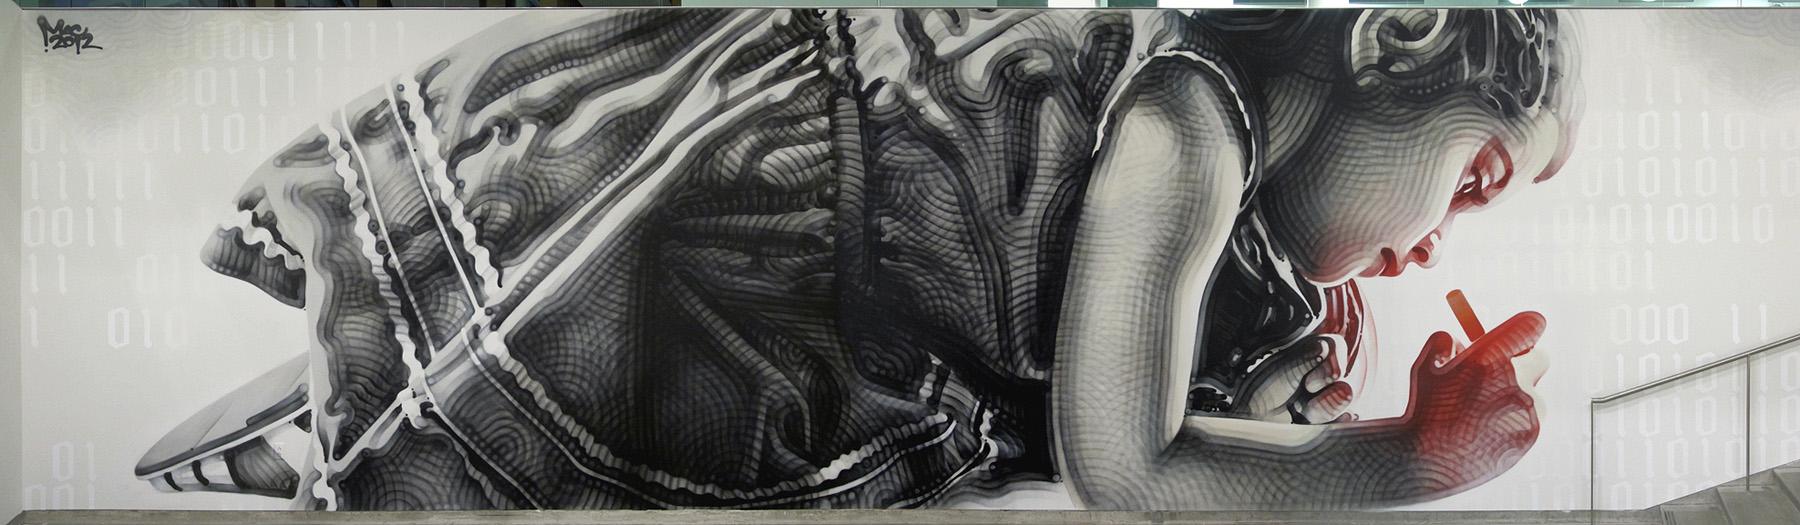 https://i1.wp.com/d3zr9vspdnjxi.cloudfront.net/artistInfo/elmacnet/original/995.jpg